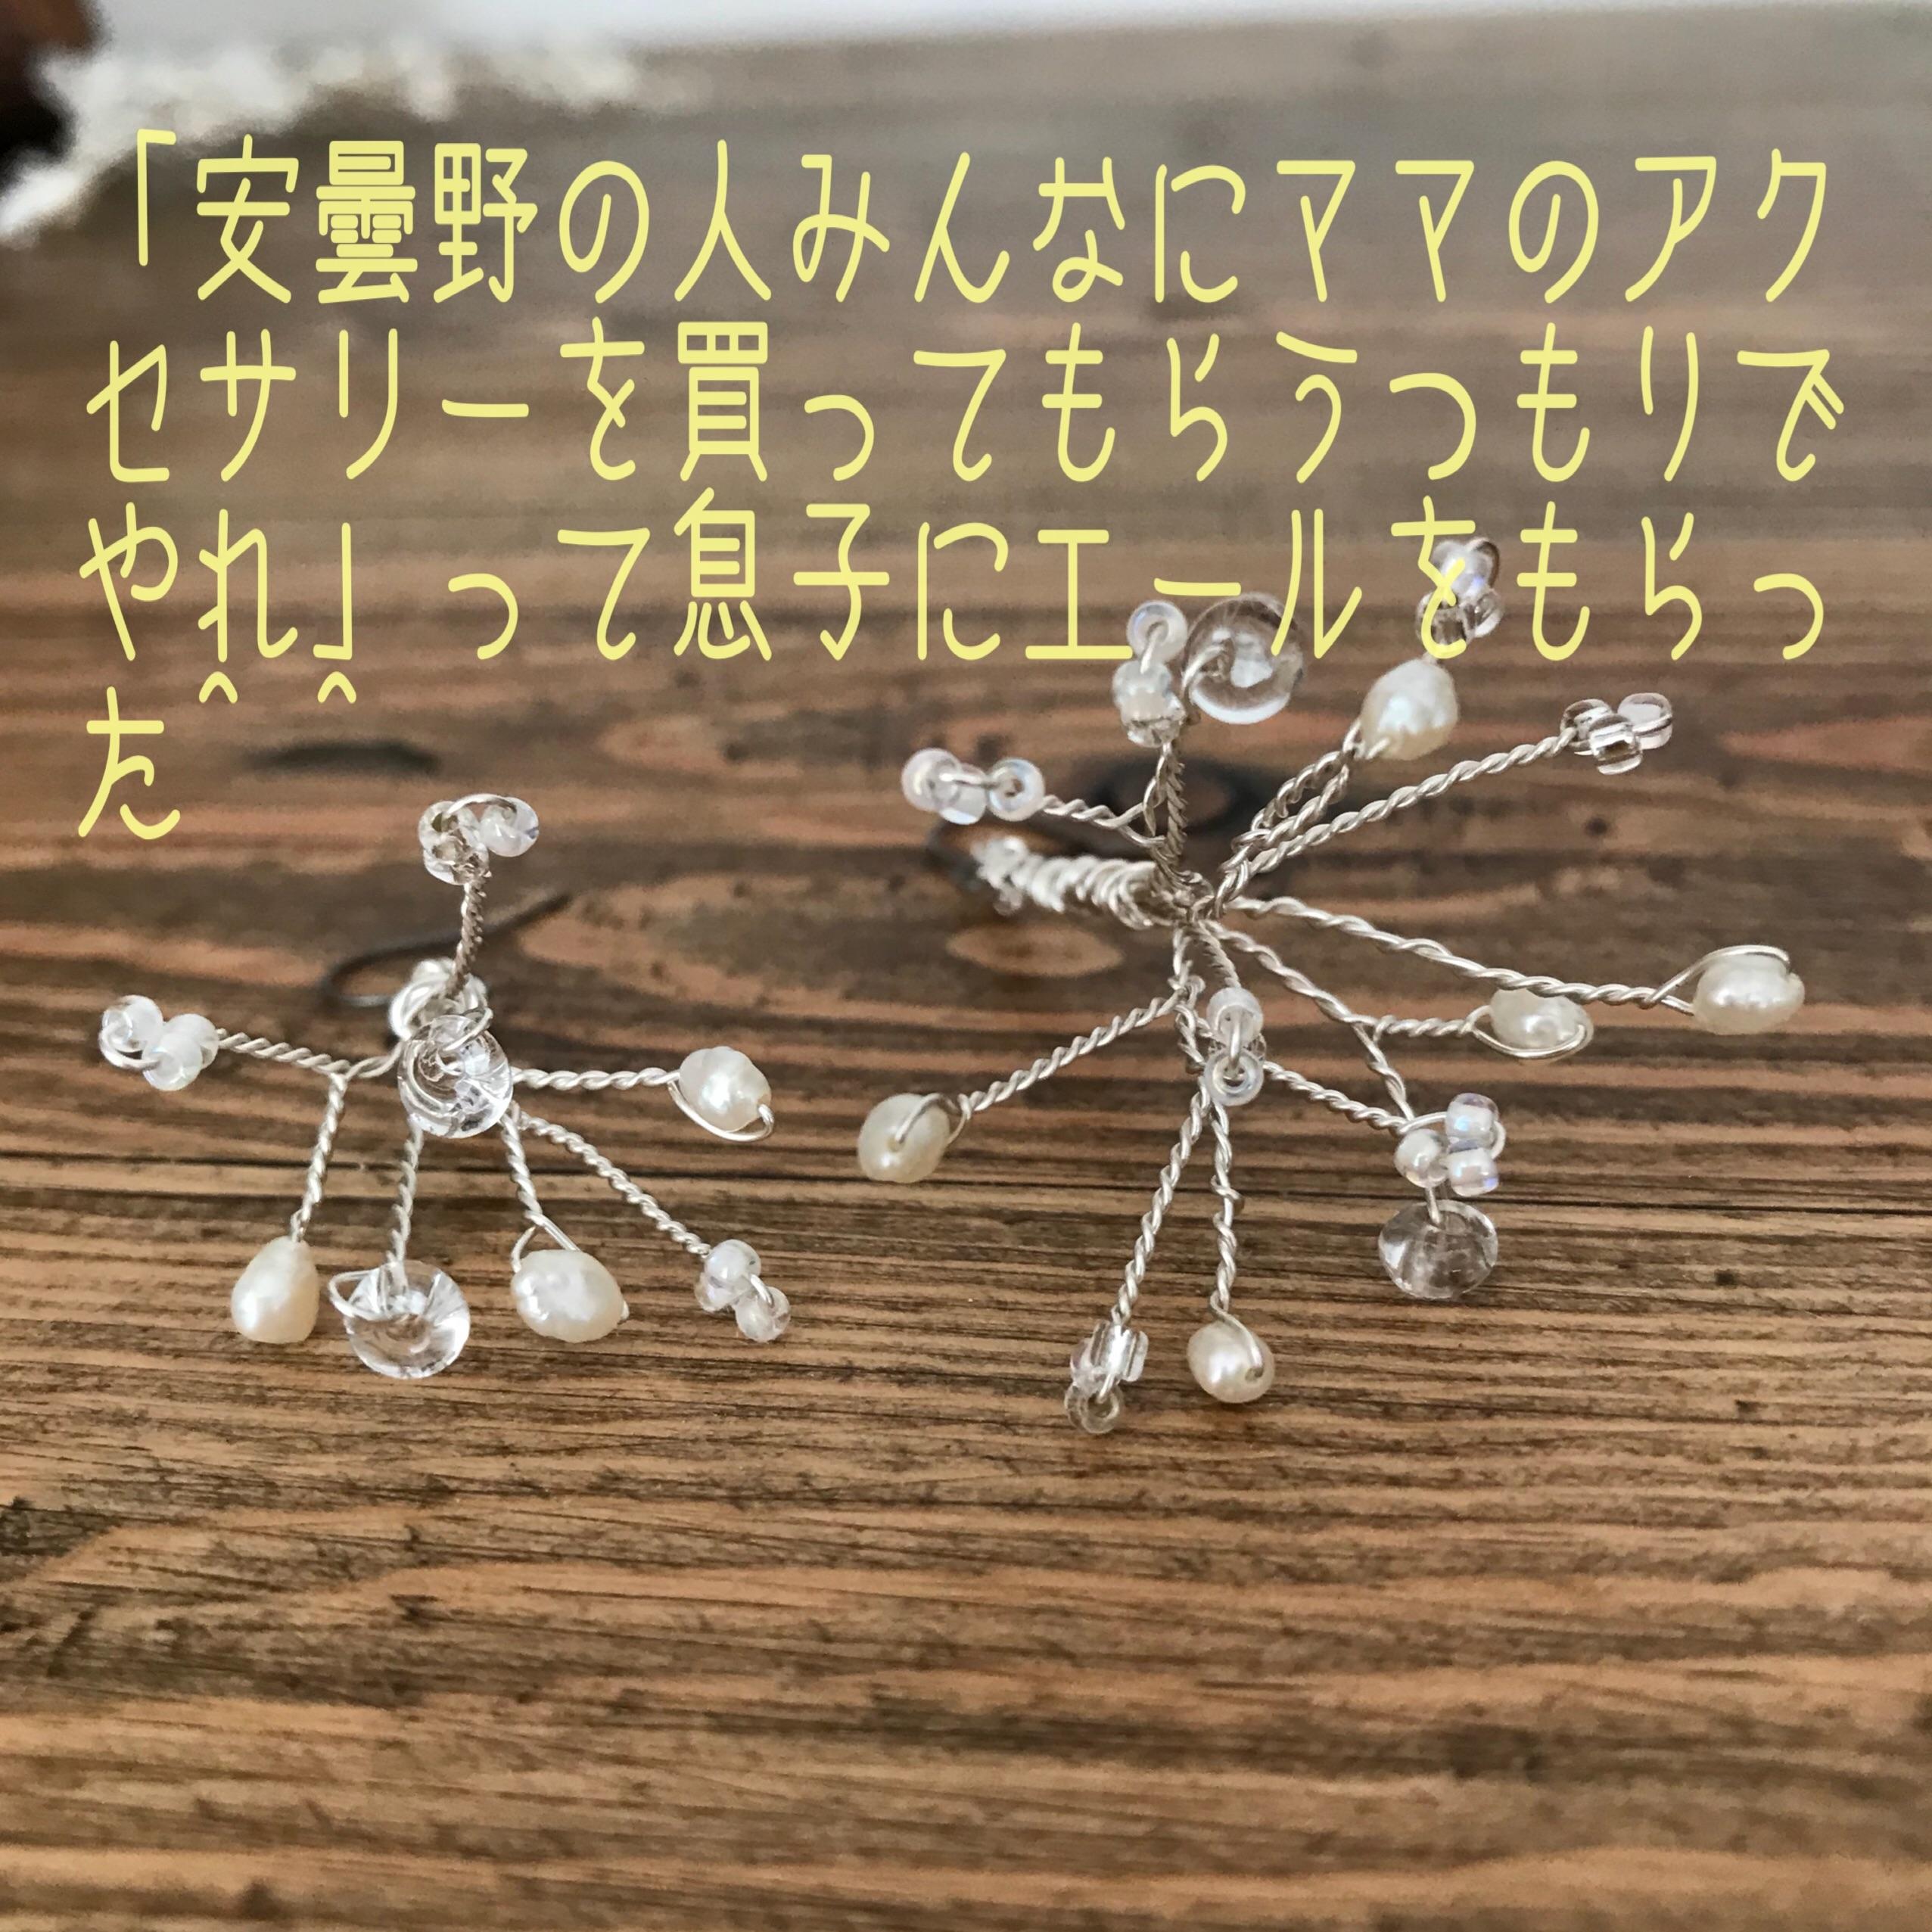 f:id:lovecrystalchildren:20180725122033j:image